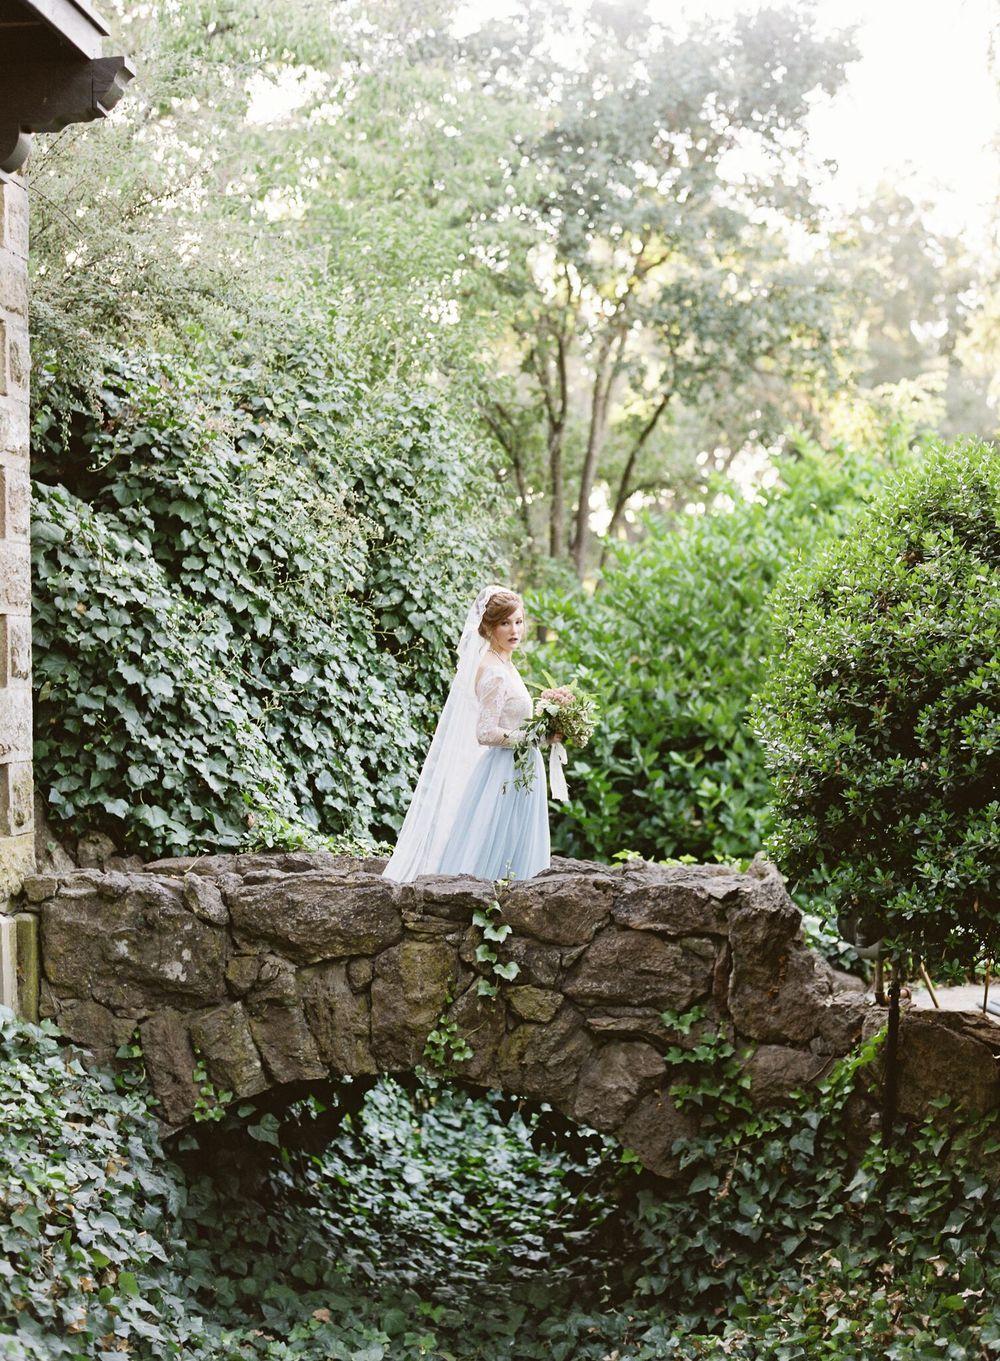 Elegant european wedding inspiration in napa valley wedding